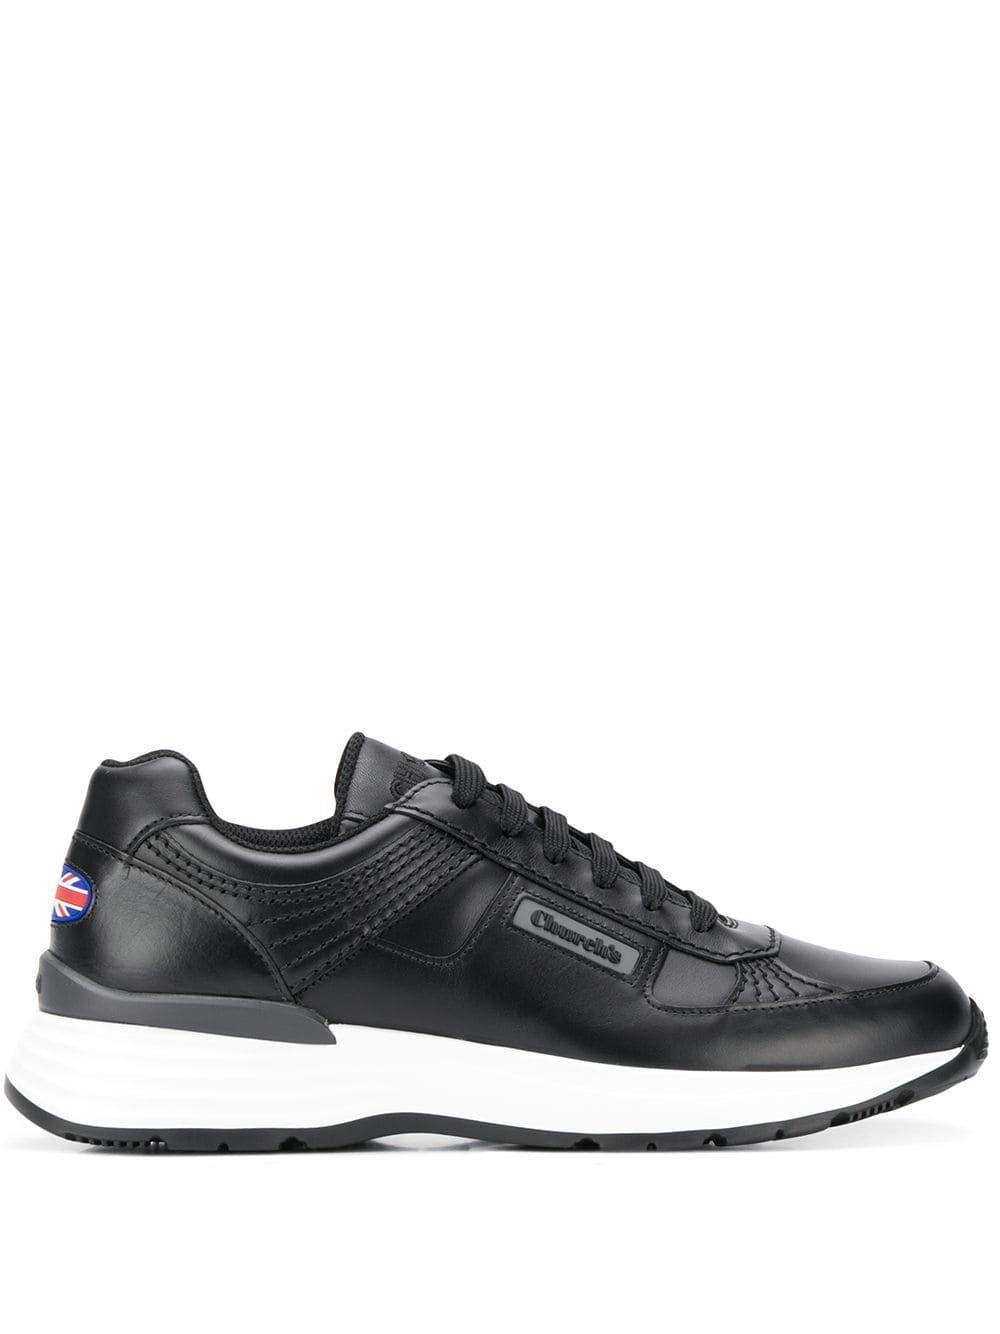 RETRO SNEAKERS - BLACK. #churchs #shoes